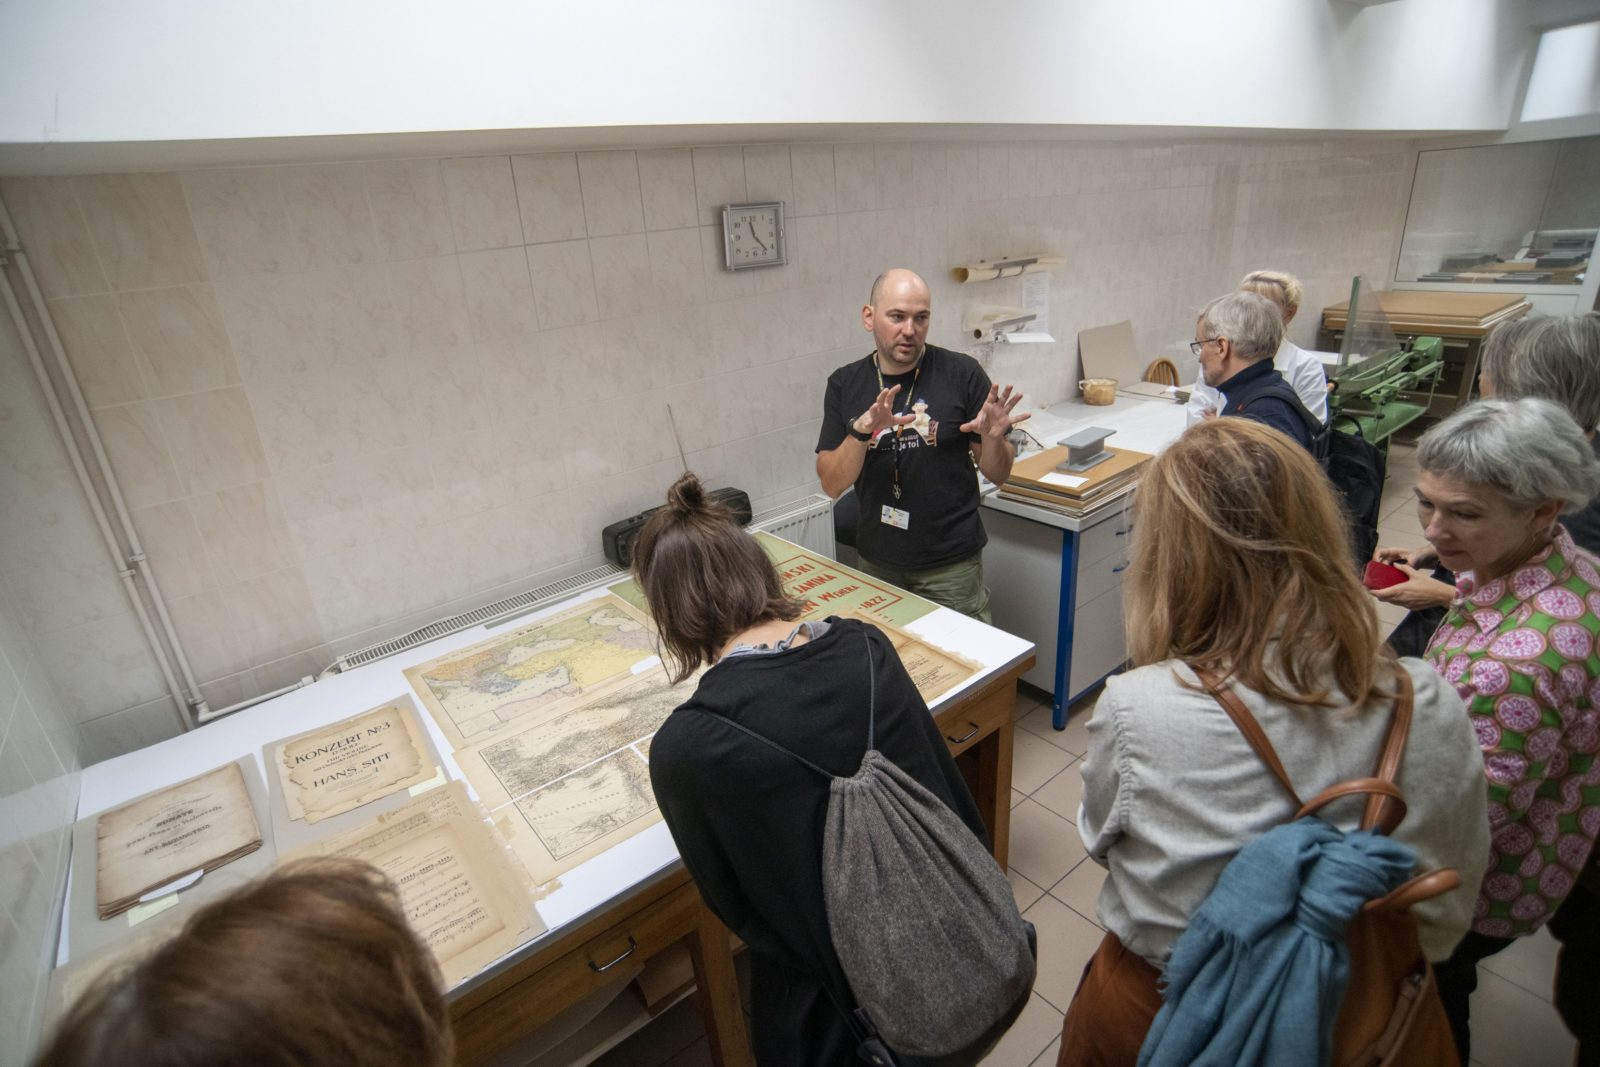 Warschau_2019_Tour_Library_of_Poland_Warsaw_Stasiuk_Konrad_179